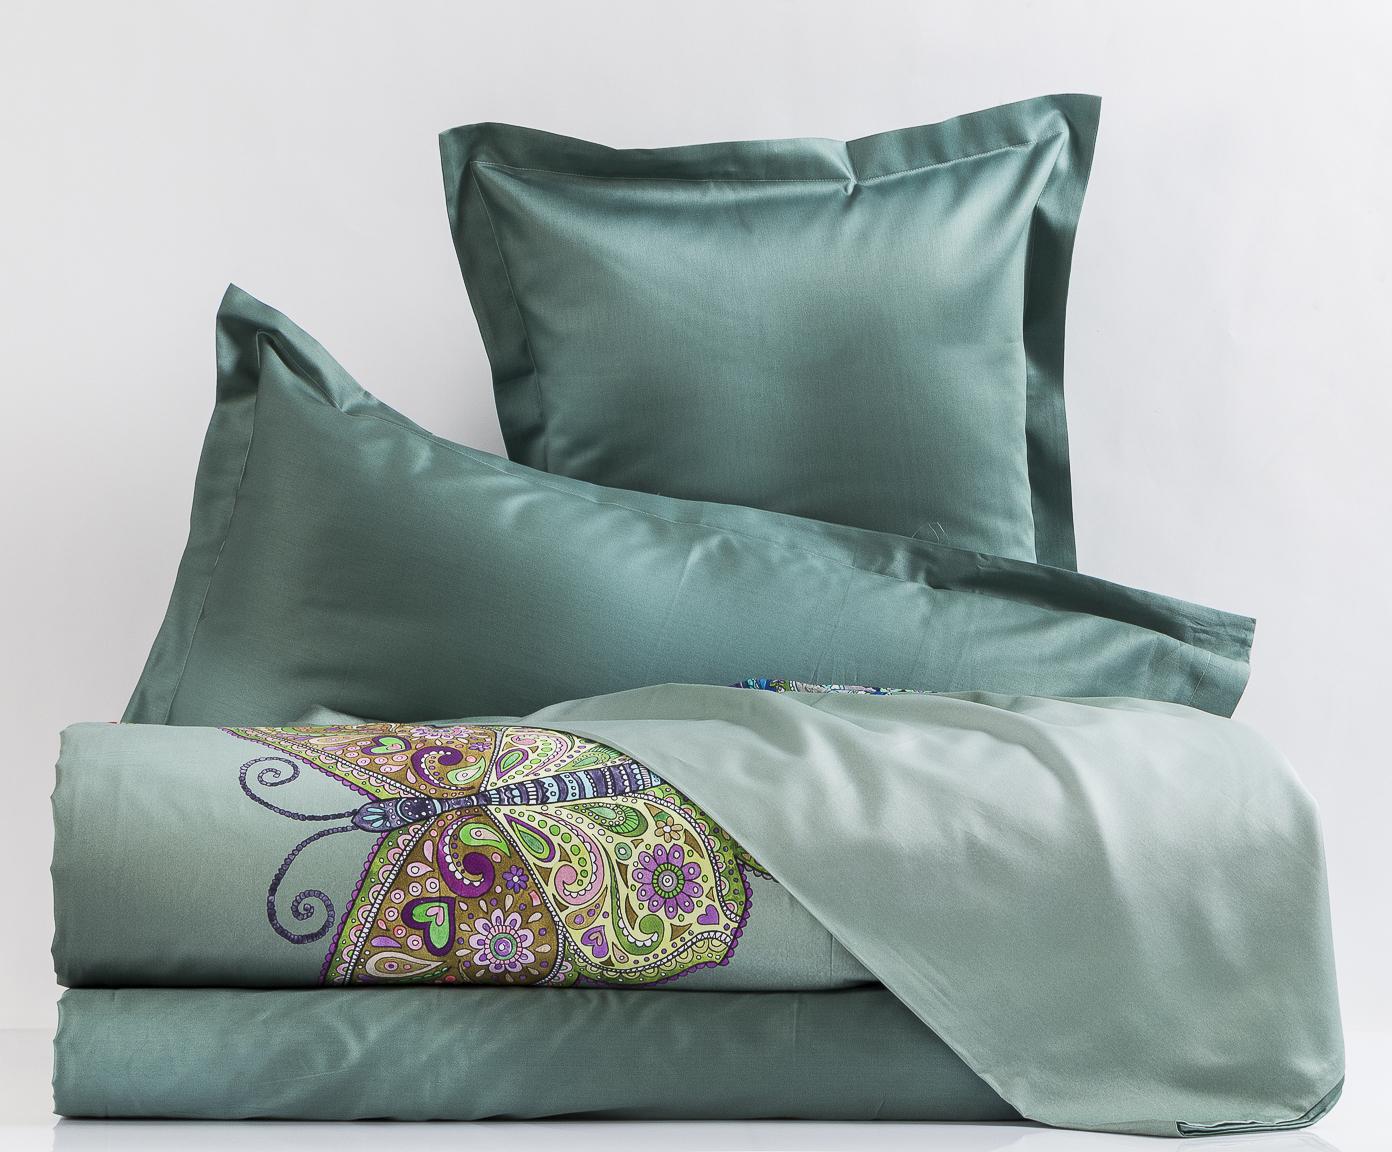 Комплекты Постельное белье 2 спальное евро Mirabello Mariposa зеленое postelnoe-belie-mirabello-mariposa-zelenoe-italiya.jpg